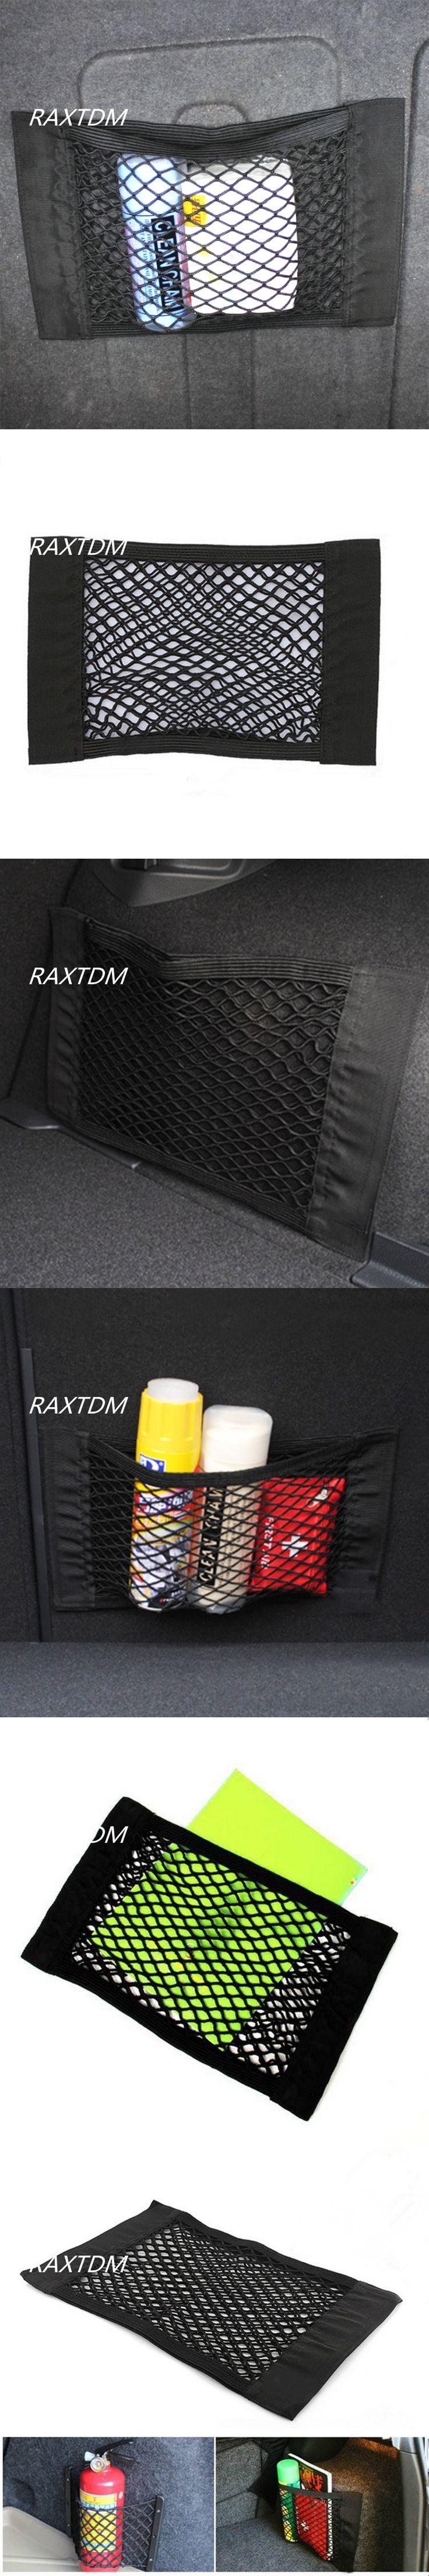 Car styling , Car Boot Cargo Net Magic Sticker Luggage Mesh Oganizer Bag For Lexus GS350 GS450h LX570 RX450h CT200h ES350 IS250